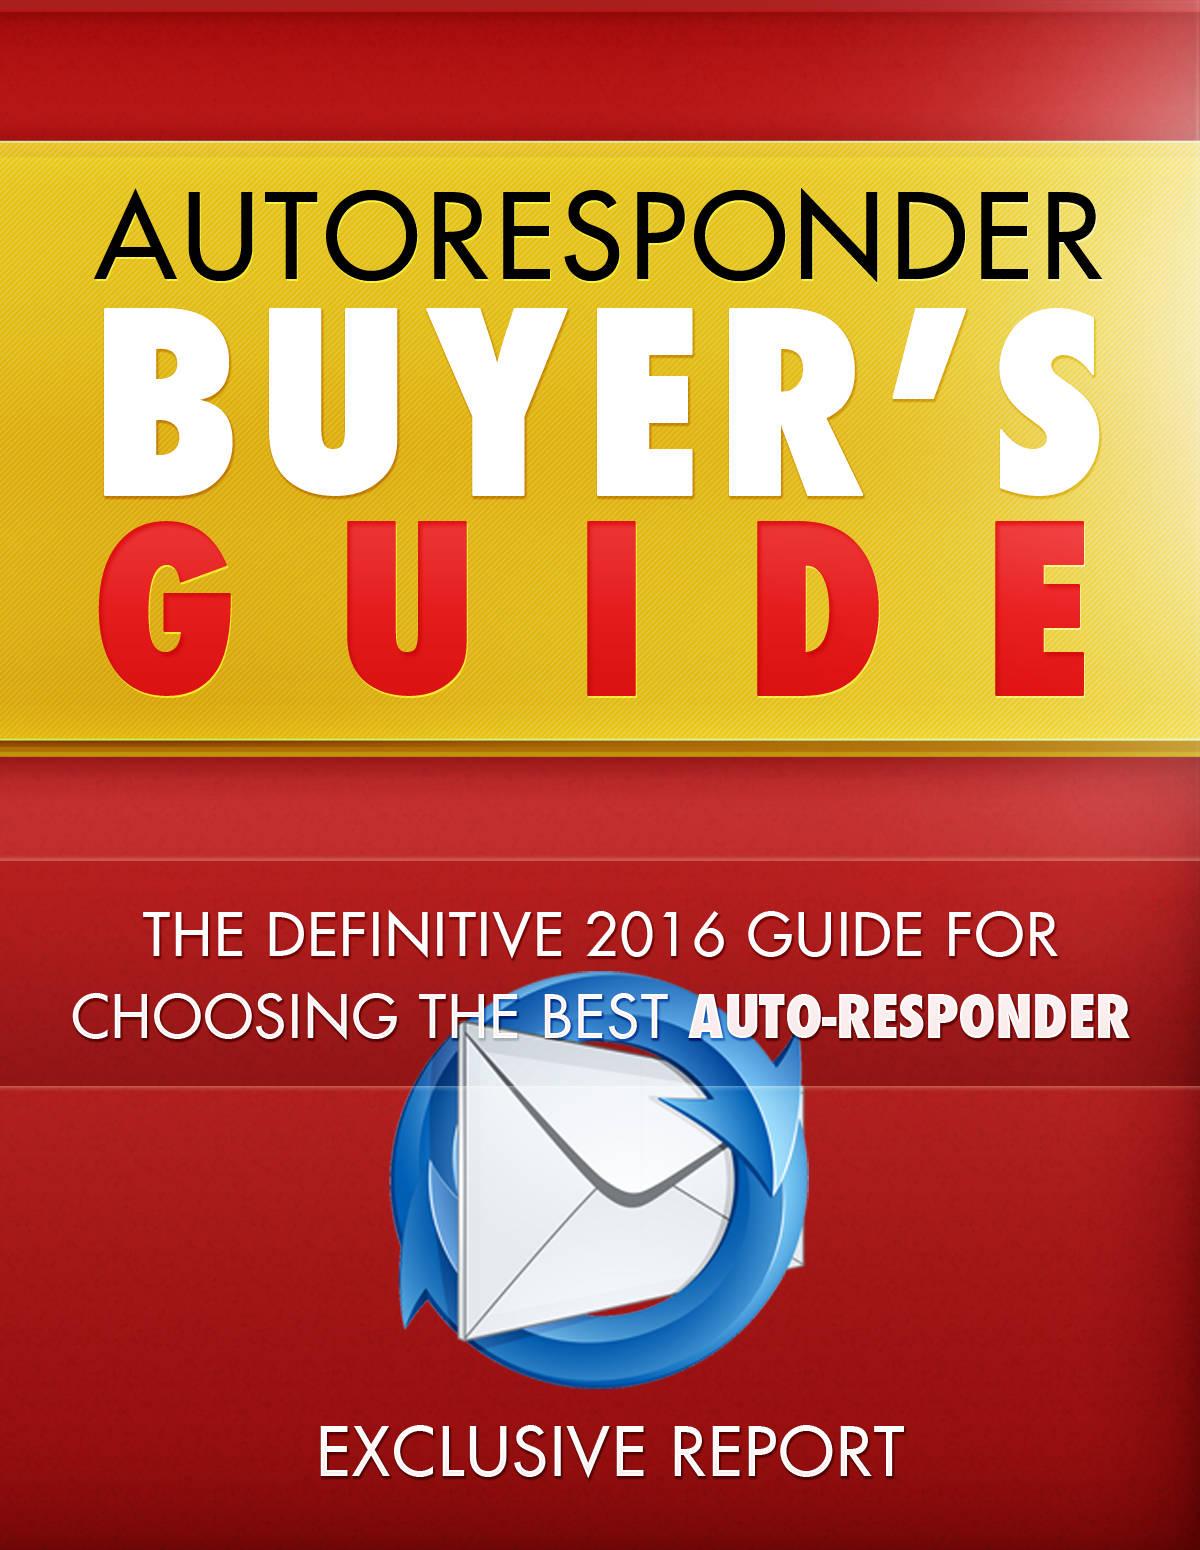 cover - Choosing The Best Autoresponder Alternative Based On Needs